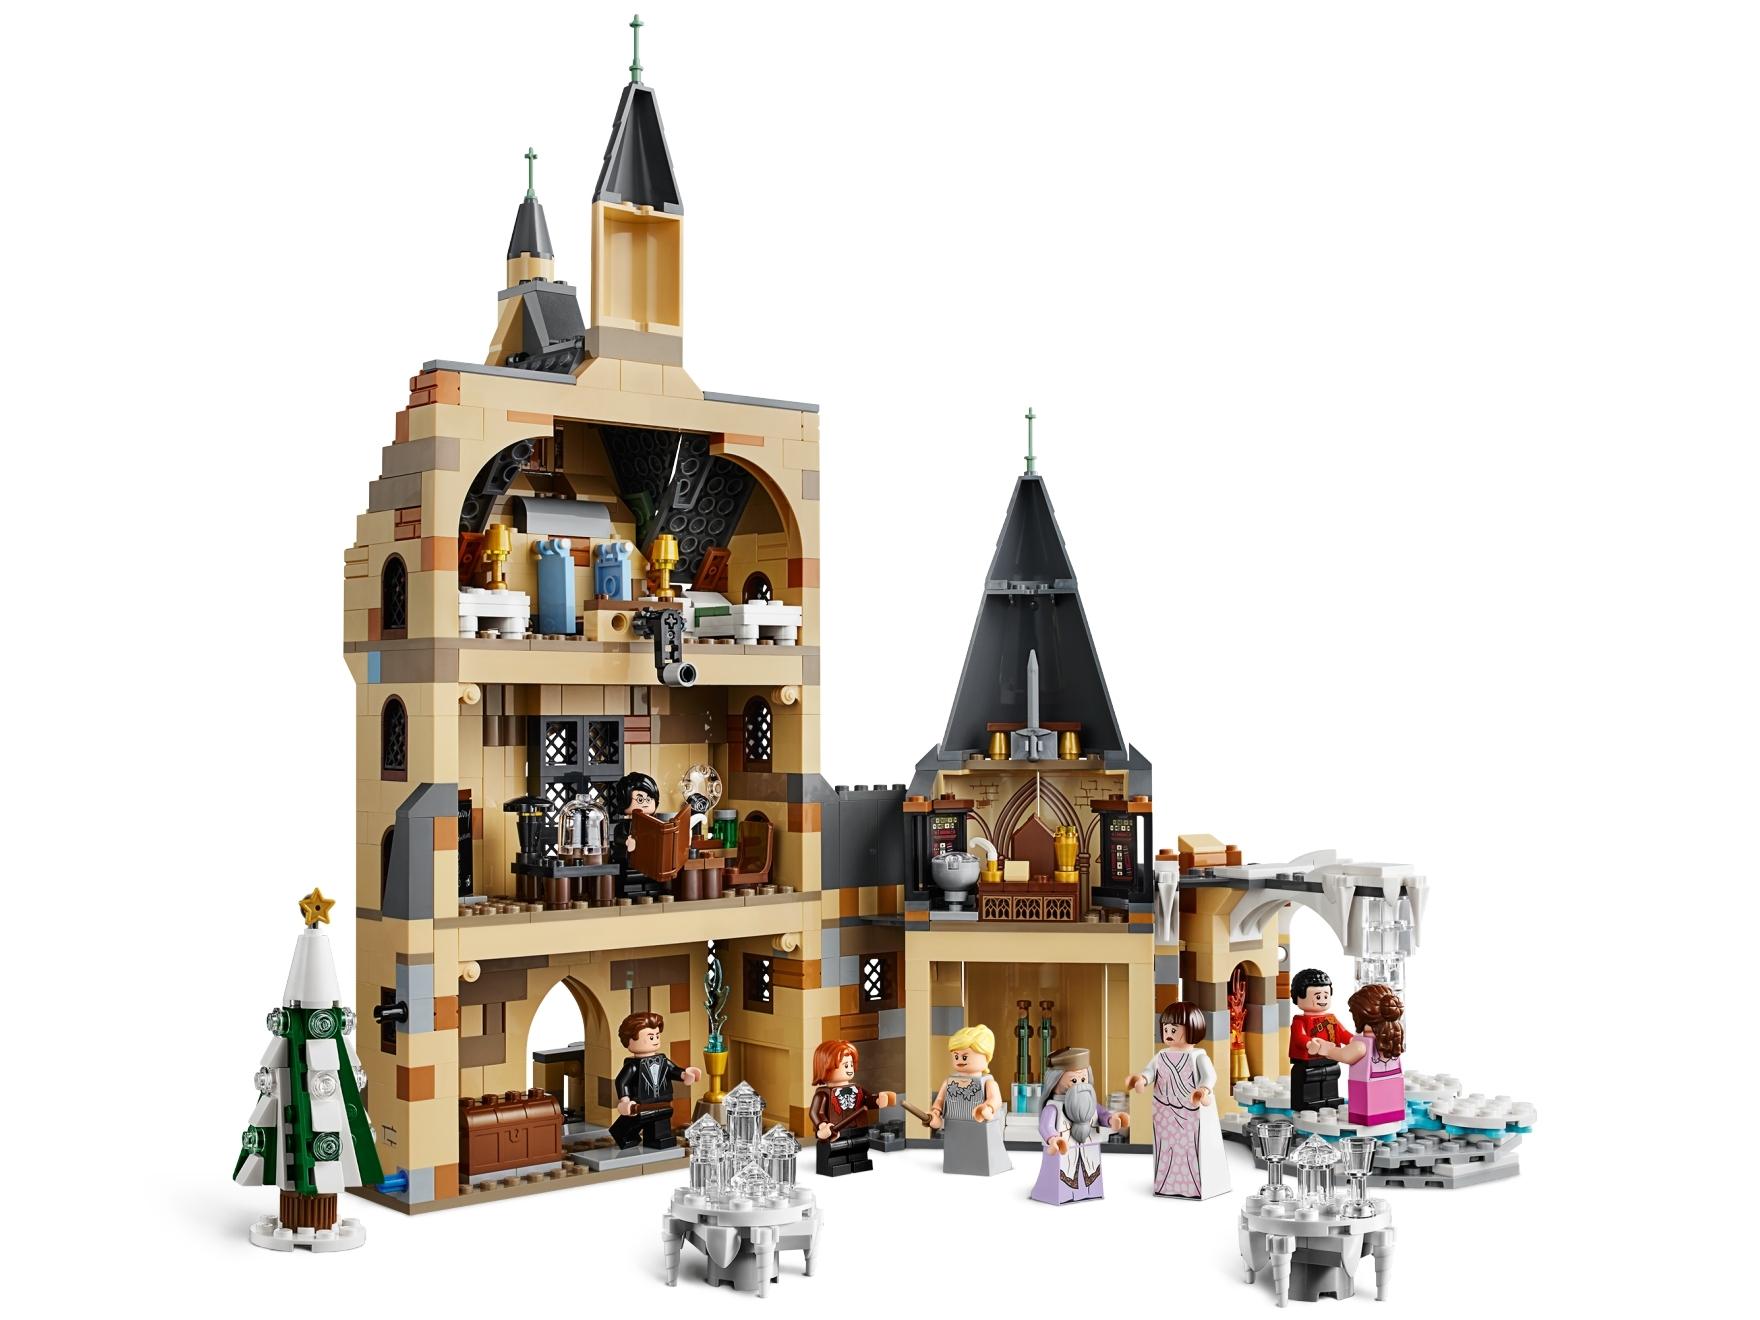 Details about  /LEGO Harry Potter FLEUR DELACOUR MINIFIGURE from 75948 Hogwarts Clock Tower